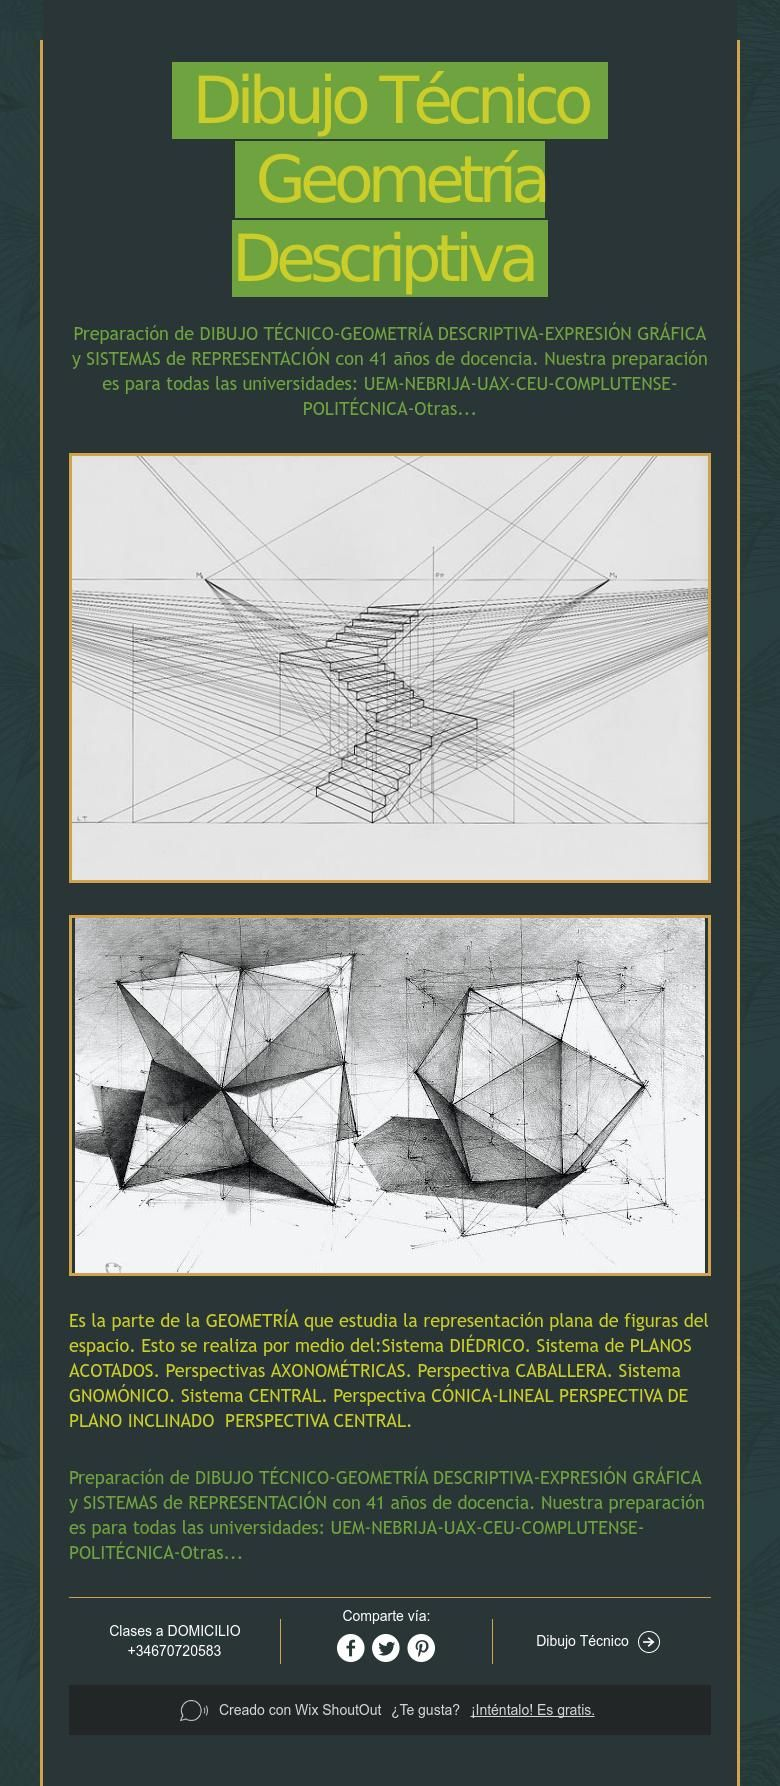 Dibujo Tecnico Geometria Descriptiva Geometria Descriptiva Tecnicas De Dibujo Geometria